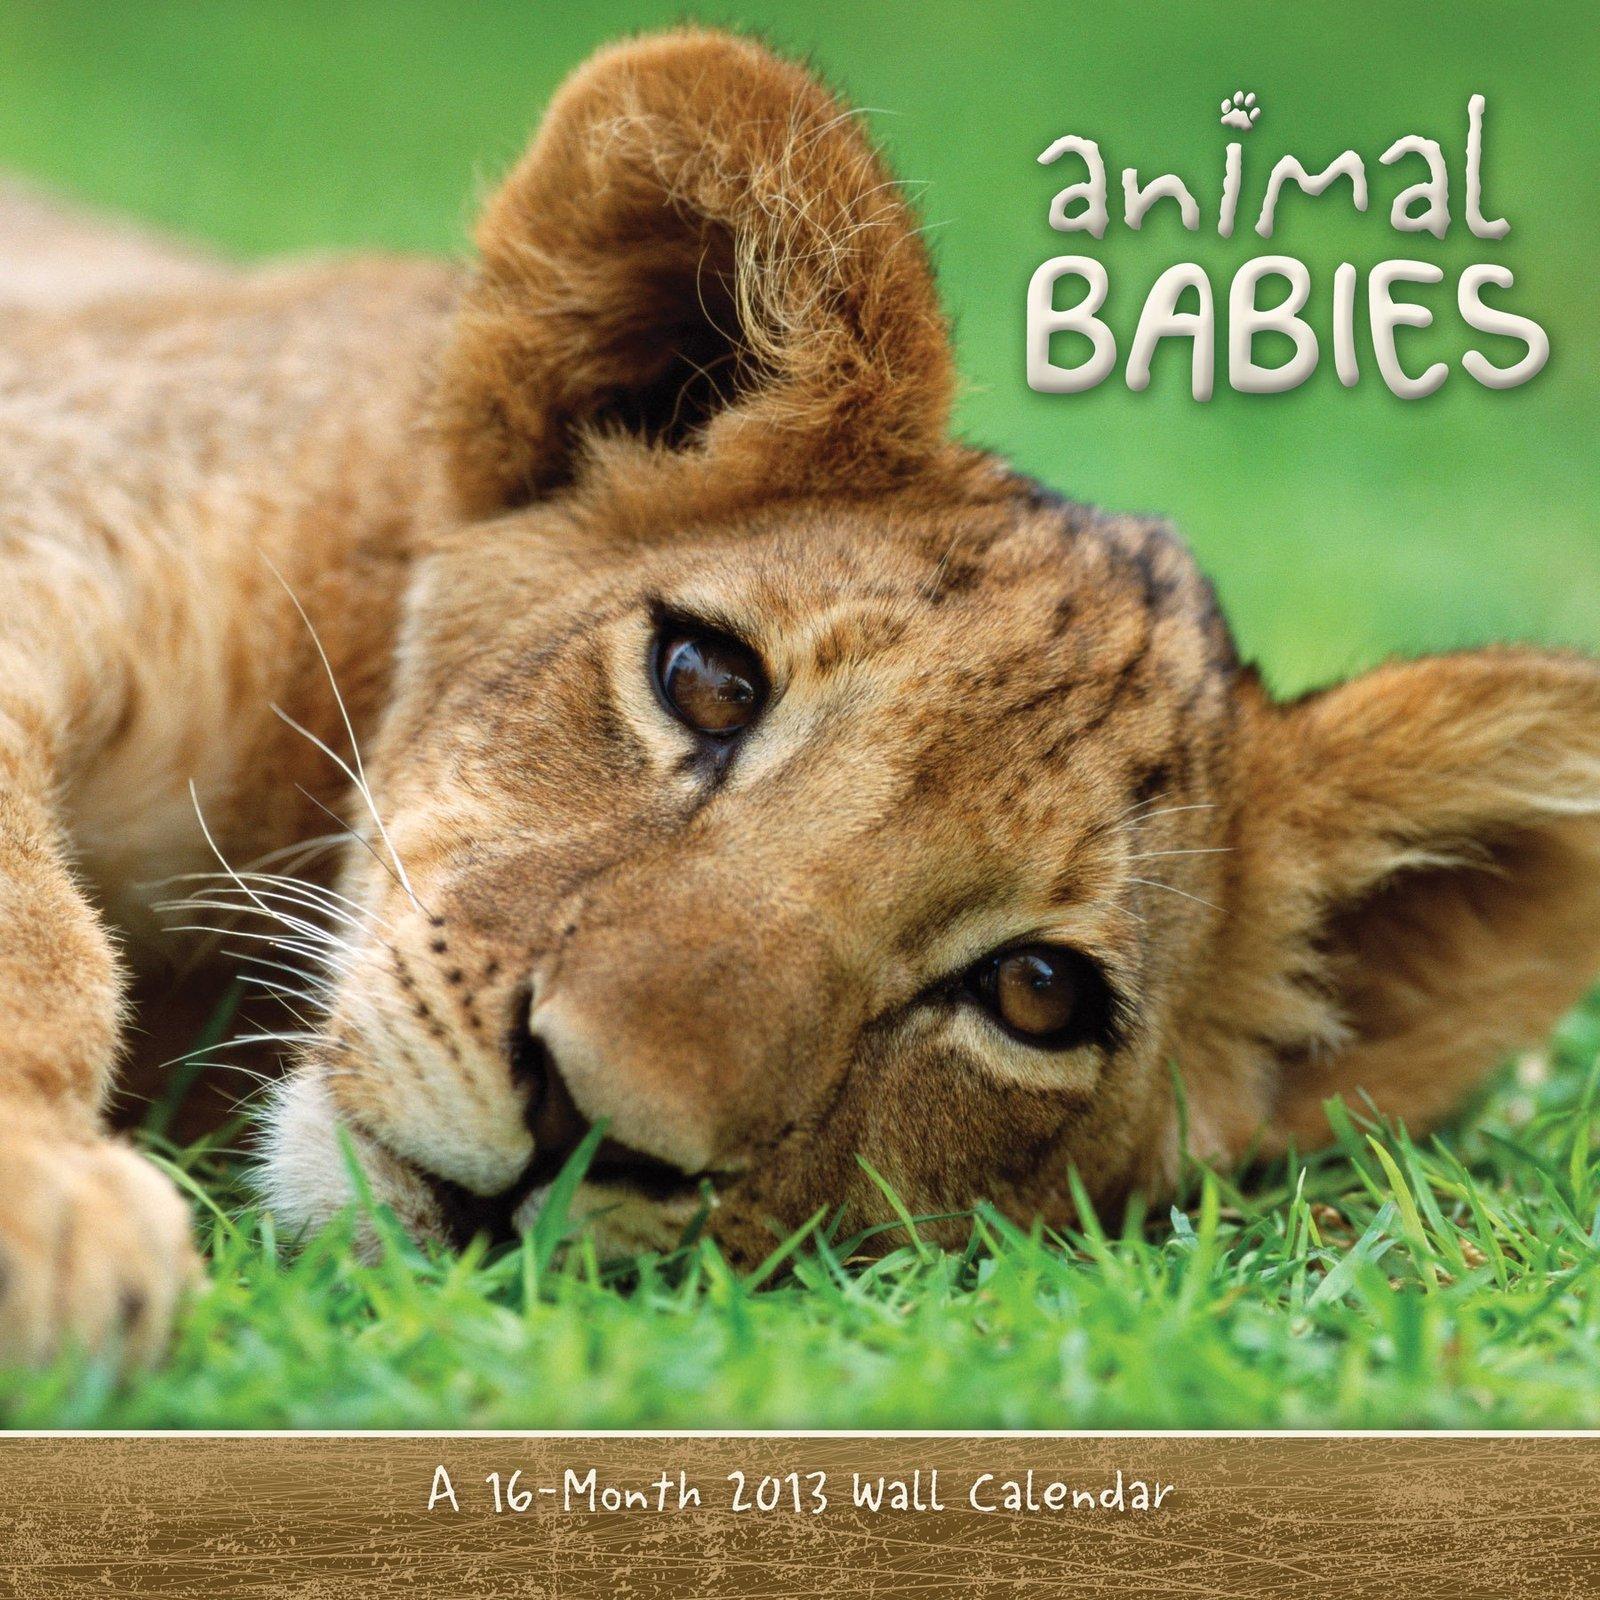 Animal Babies 2013 Wall Calendar DateWorks - $9.79